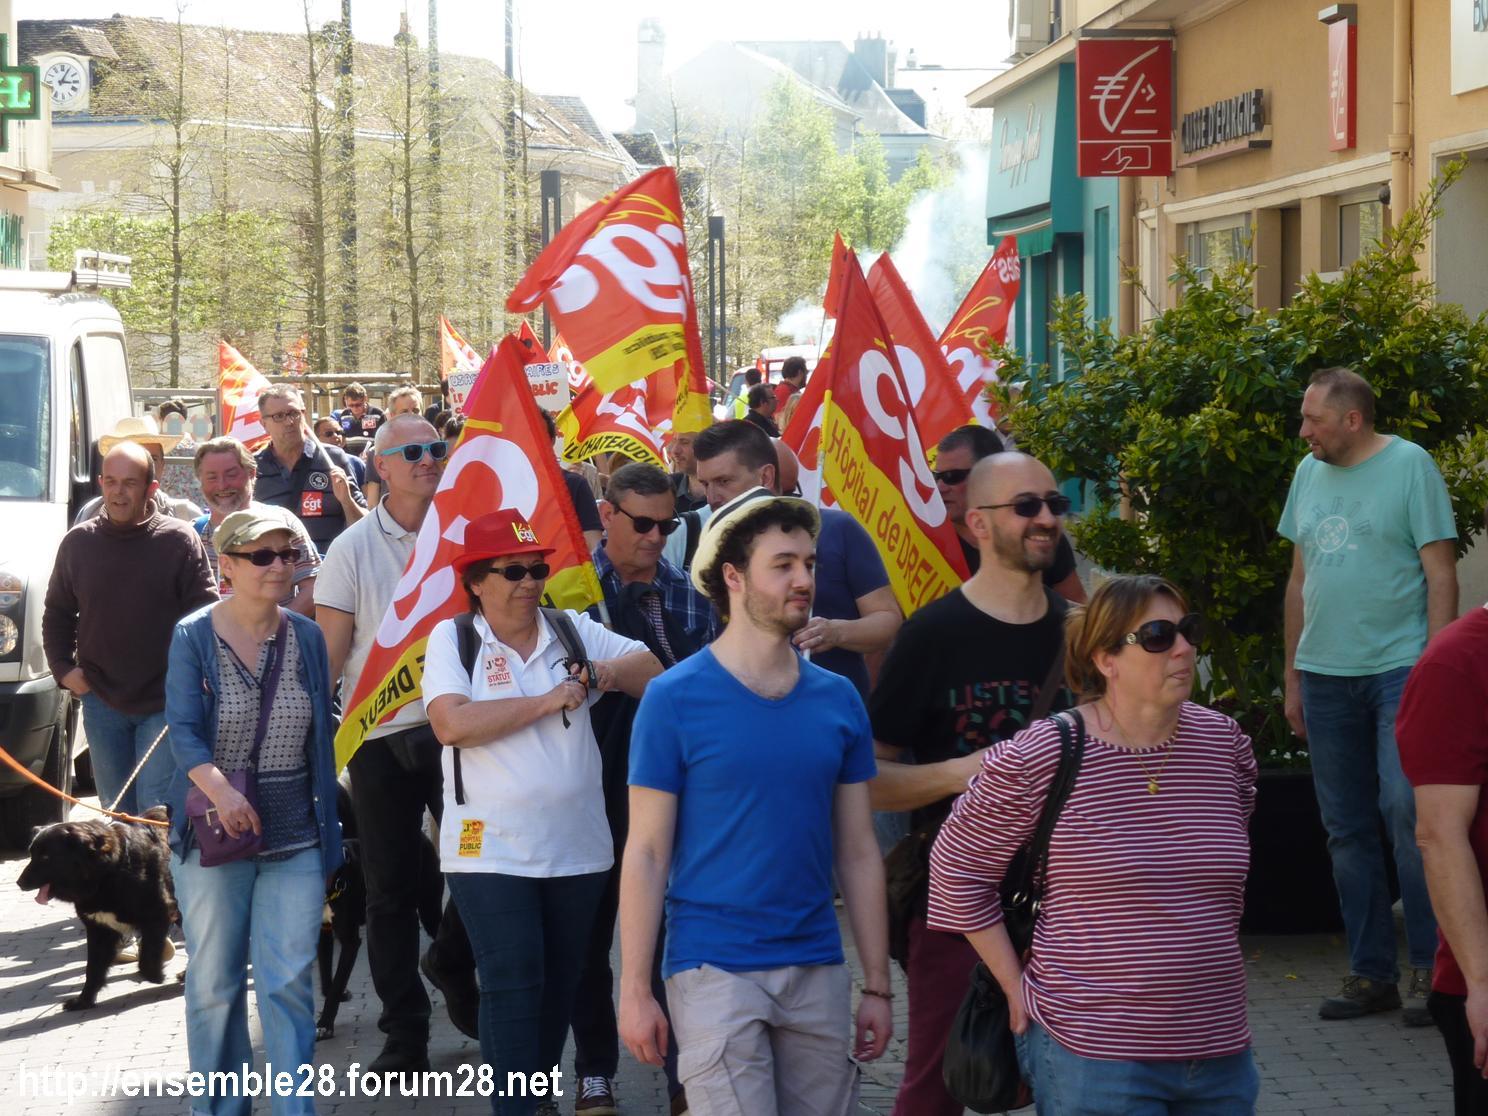 19-04-2018 Chartres Manifestation Interprofessionnelle CGT Solidaires SNES-FSU n°03